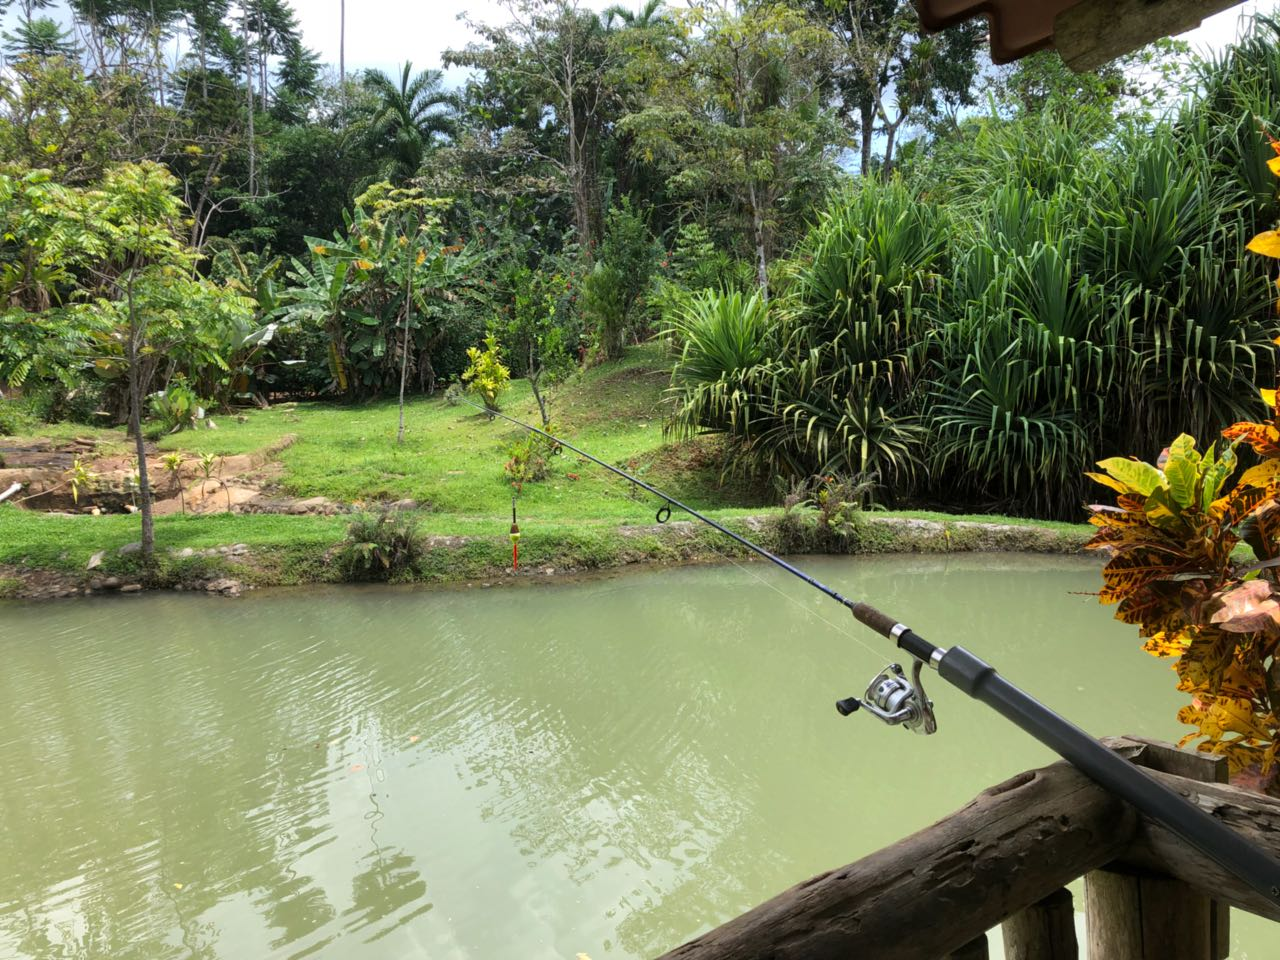 Personal Tilapia Pond!